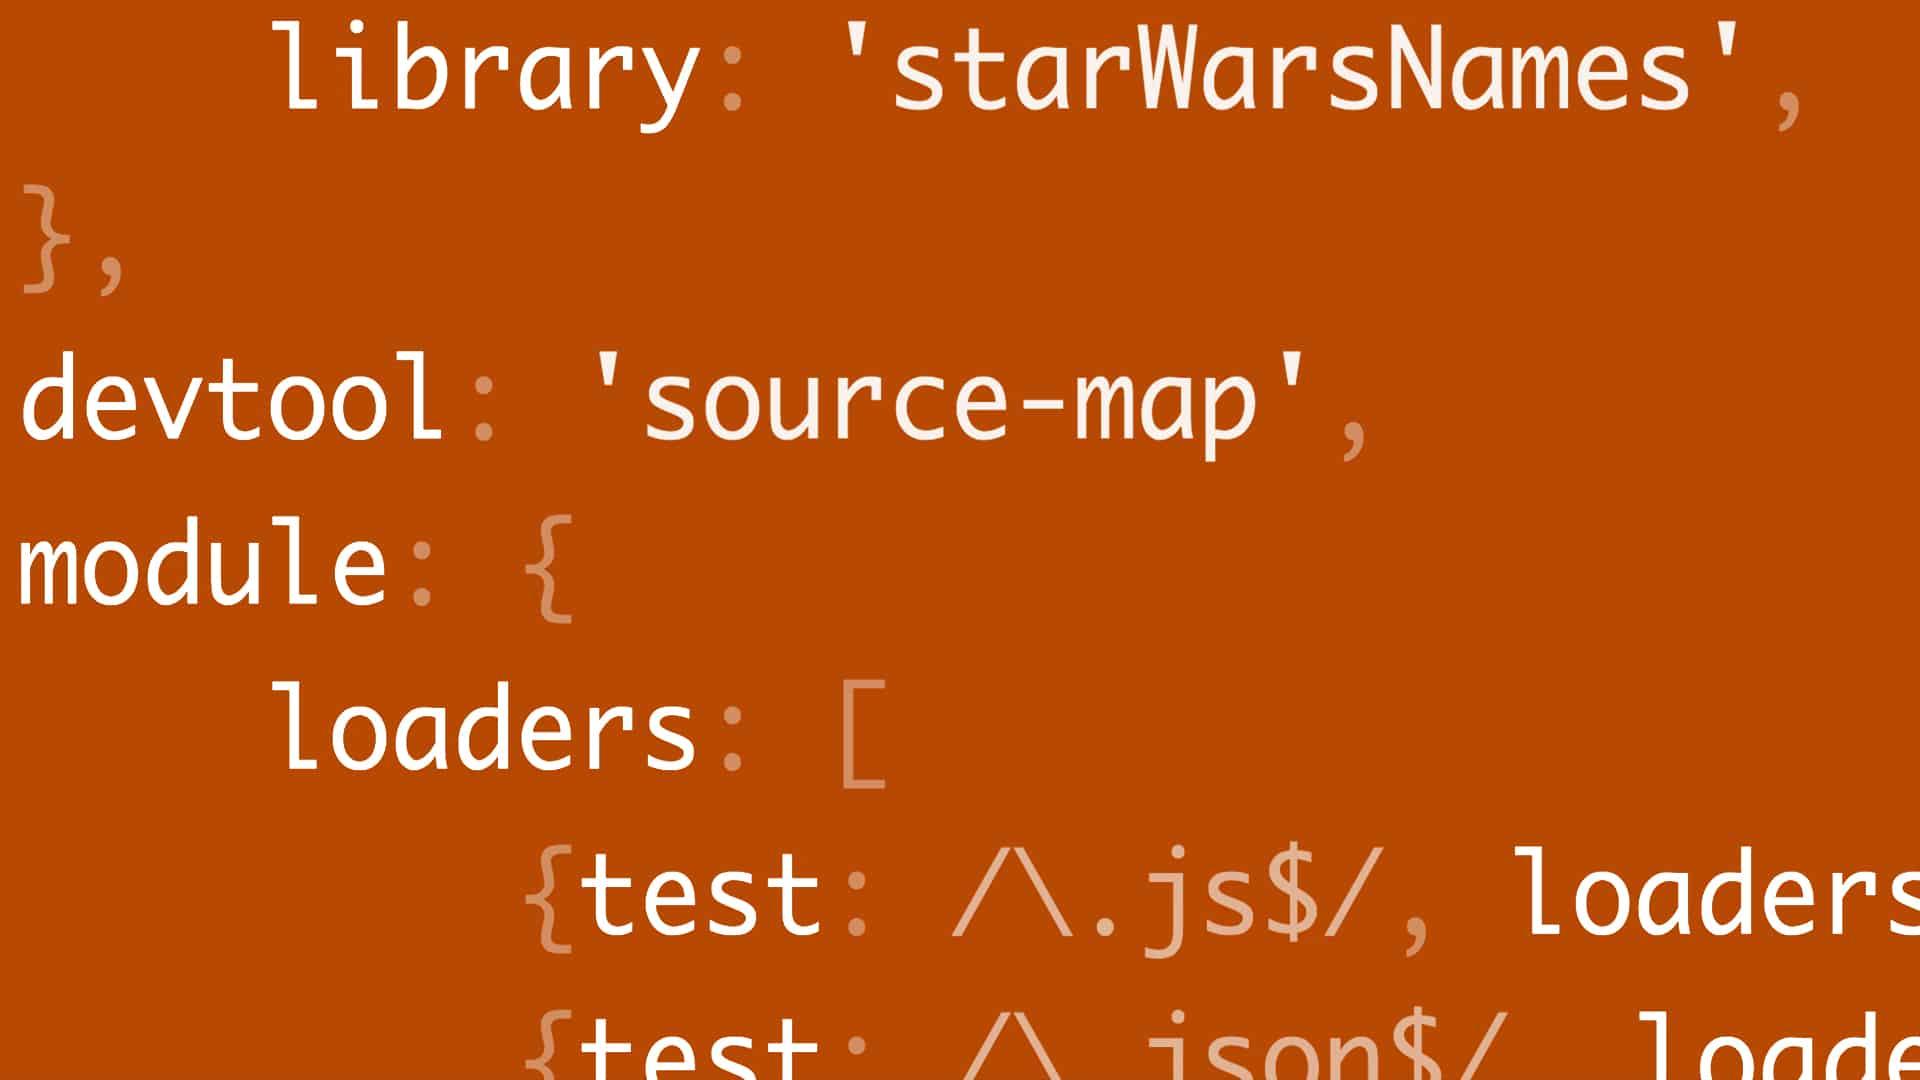 [Lynda] Creating an Open Source JavaScript Library